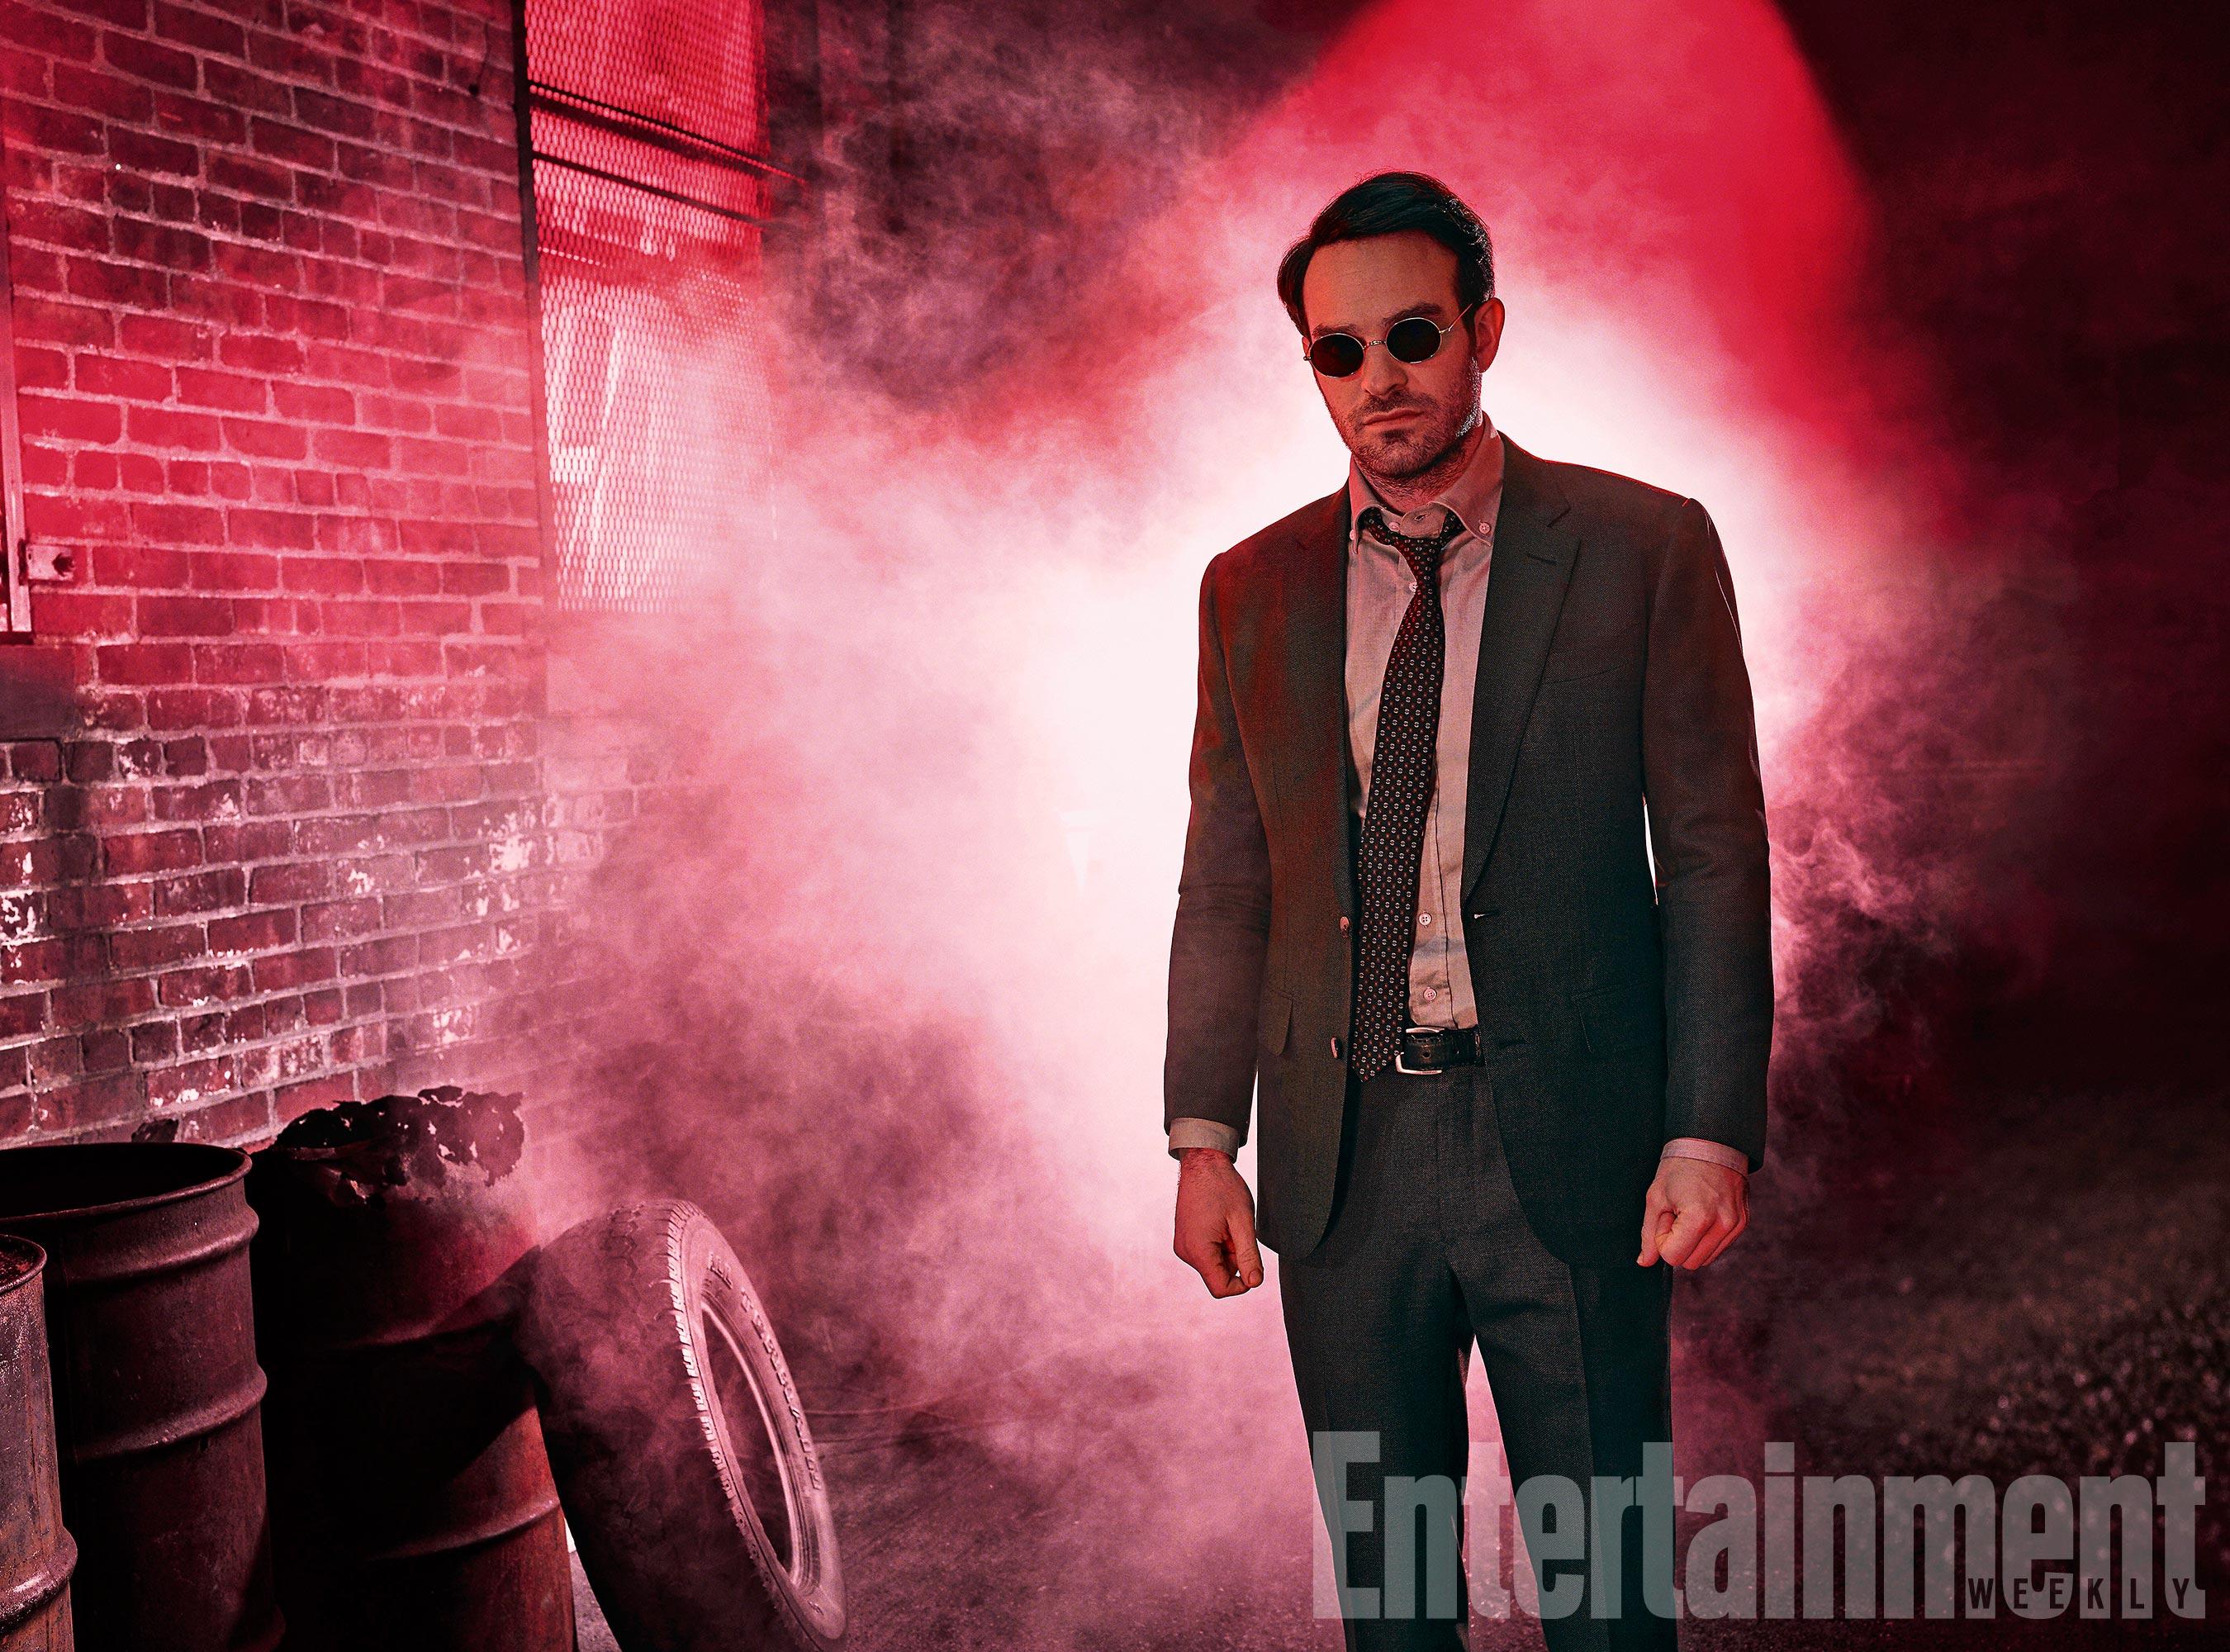 Matt Murdock, aka Daredevil